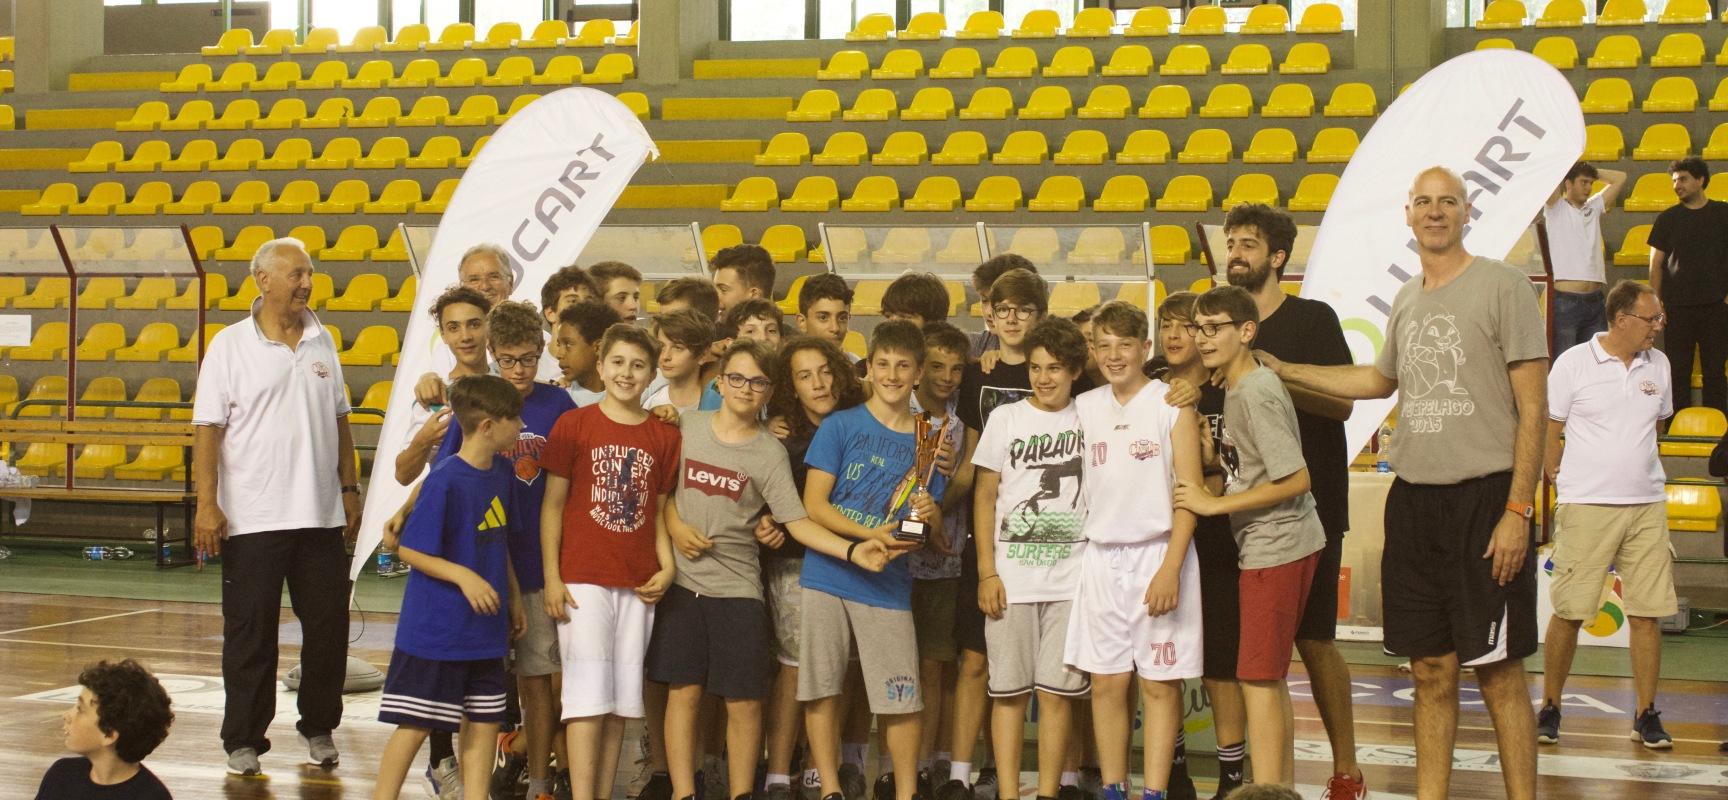 XX TORNEO NAZIONALE U13 GESAM CUP MEMORIAL DANILO CORSI